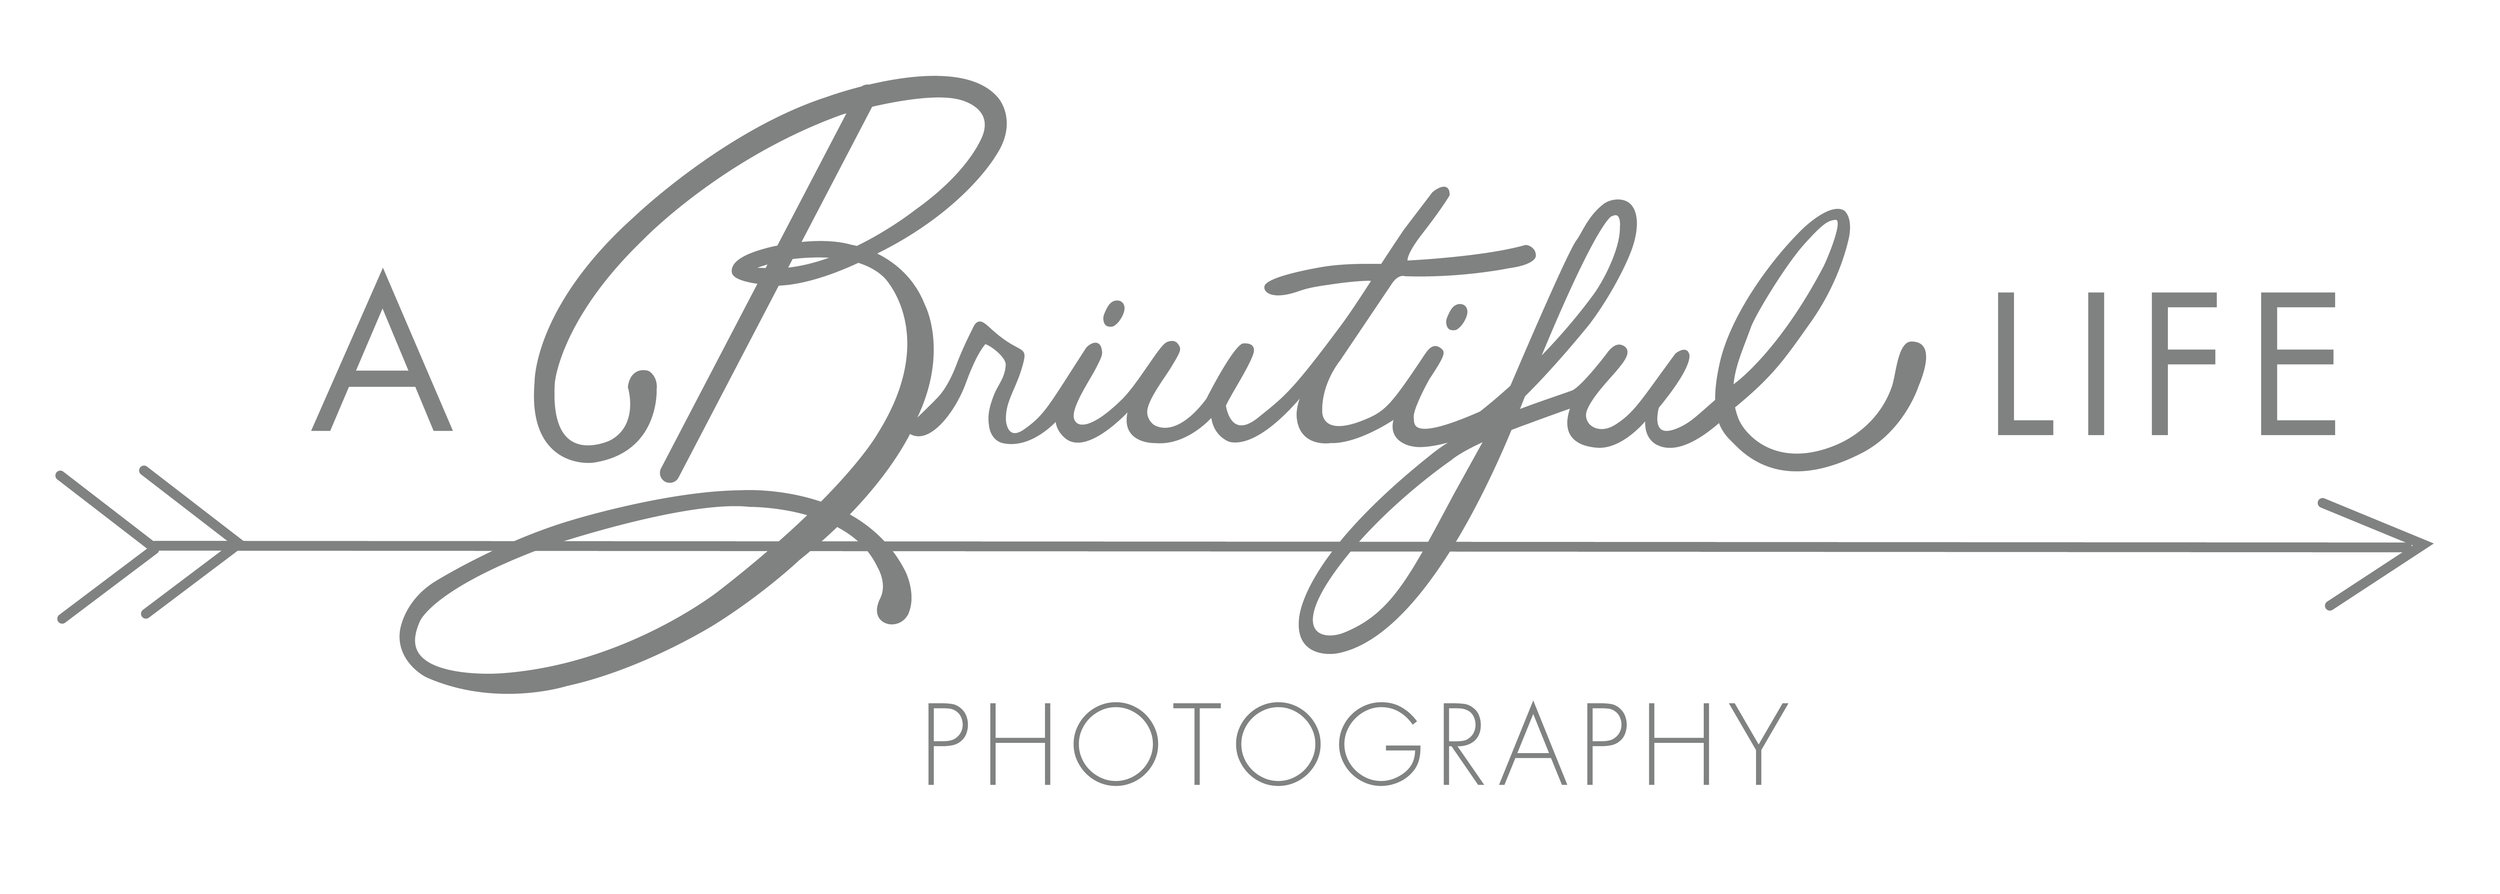 final_briutiful_life_photo-07.jpg